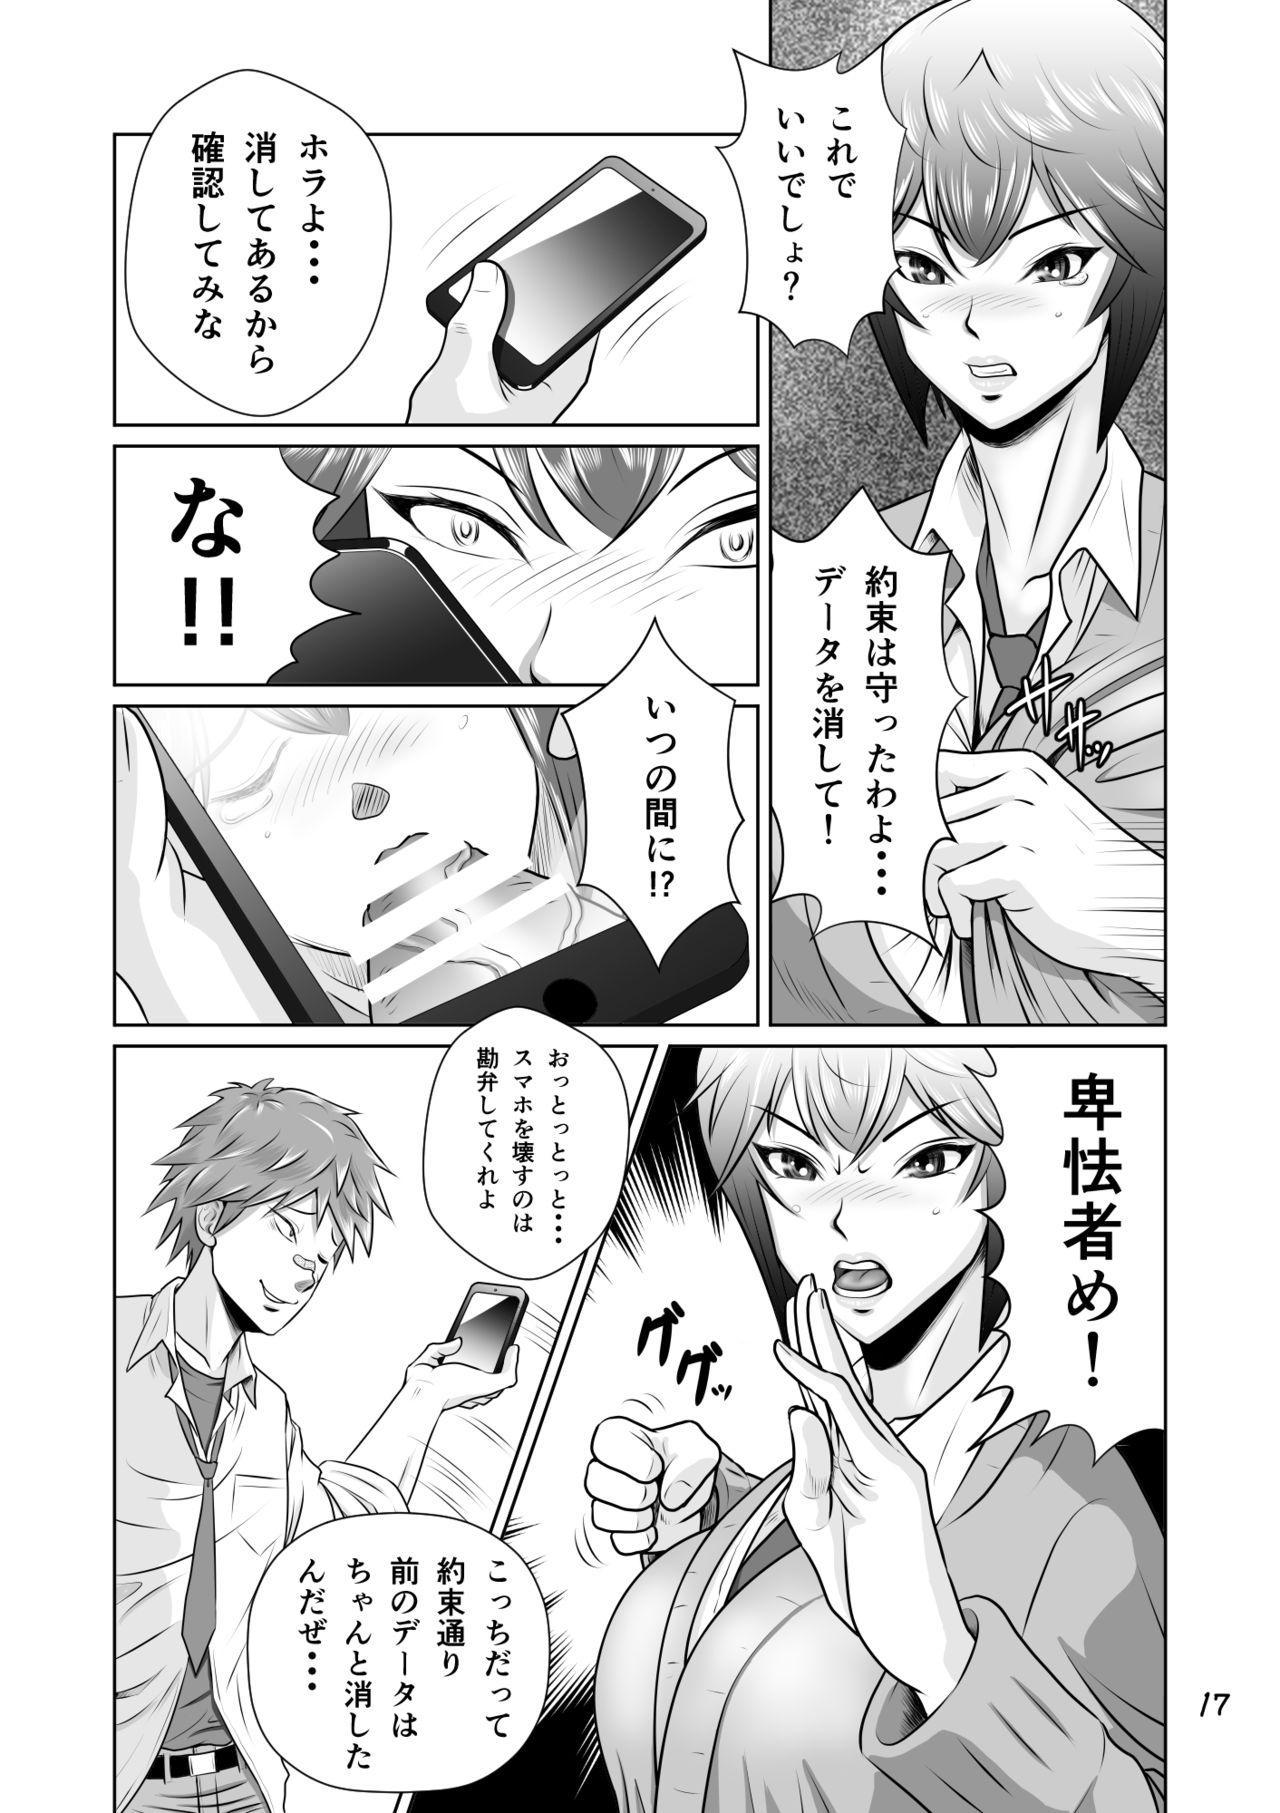 Netorare Osananajimi Haruka-chan Kiki Ippatsu!! 17